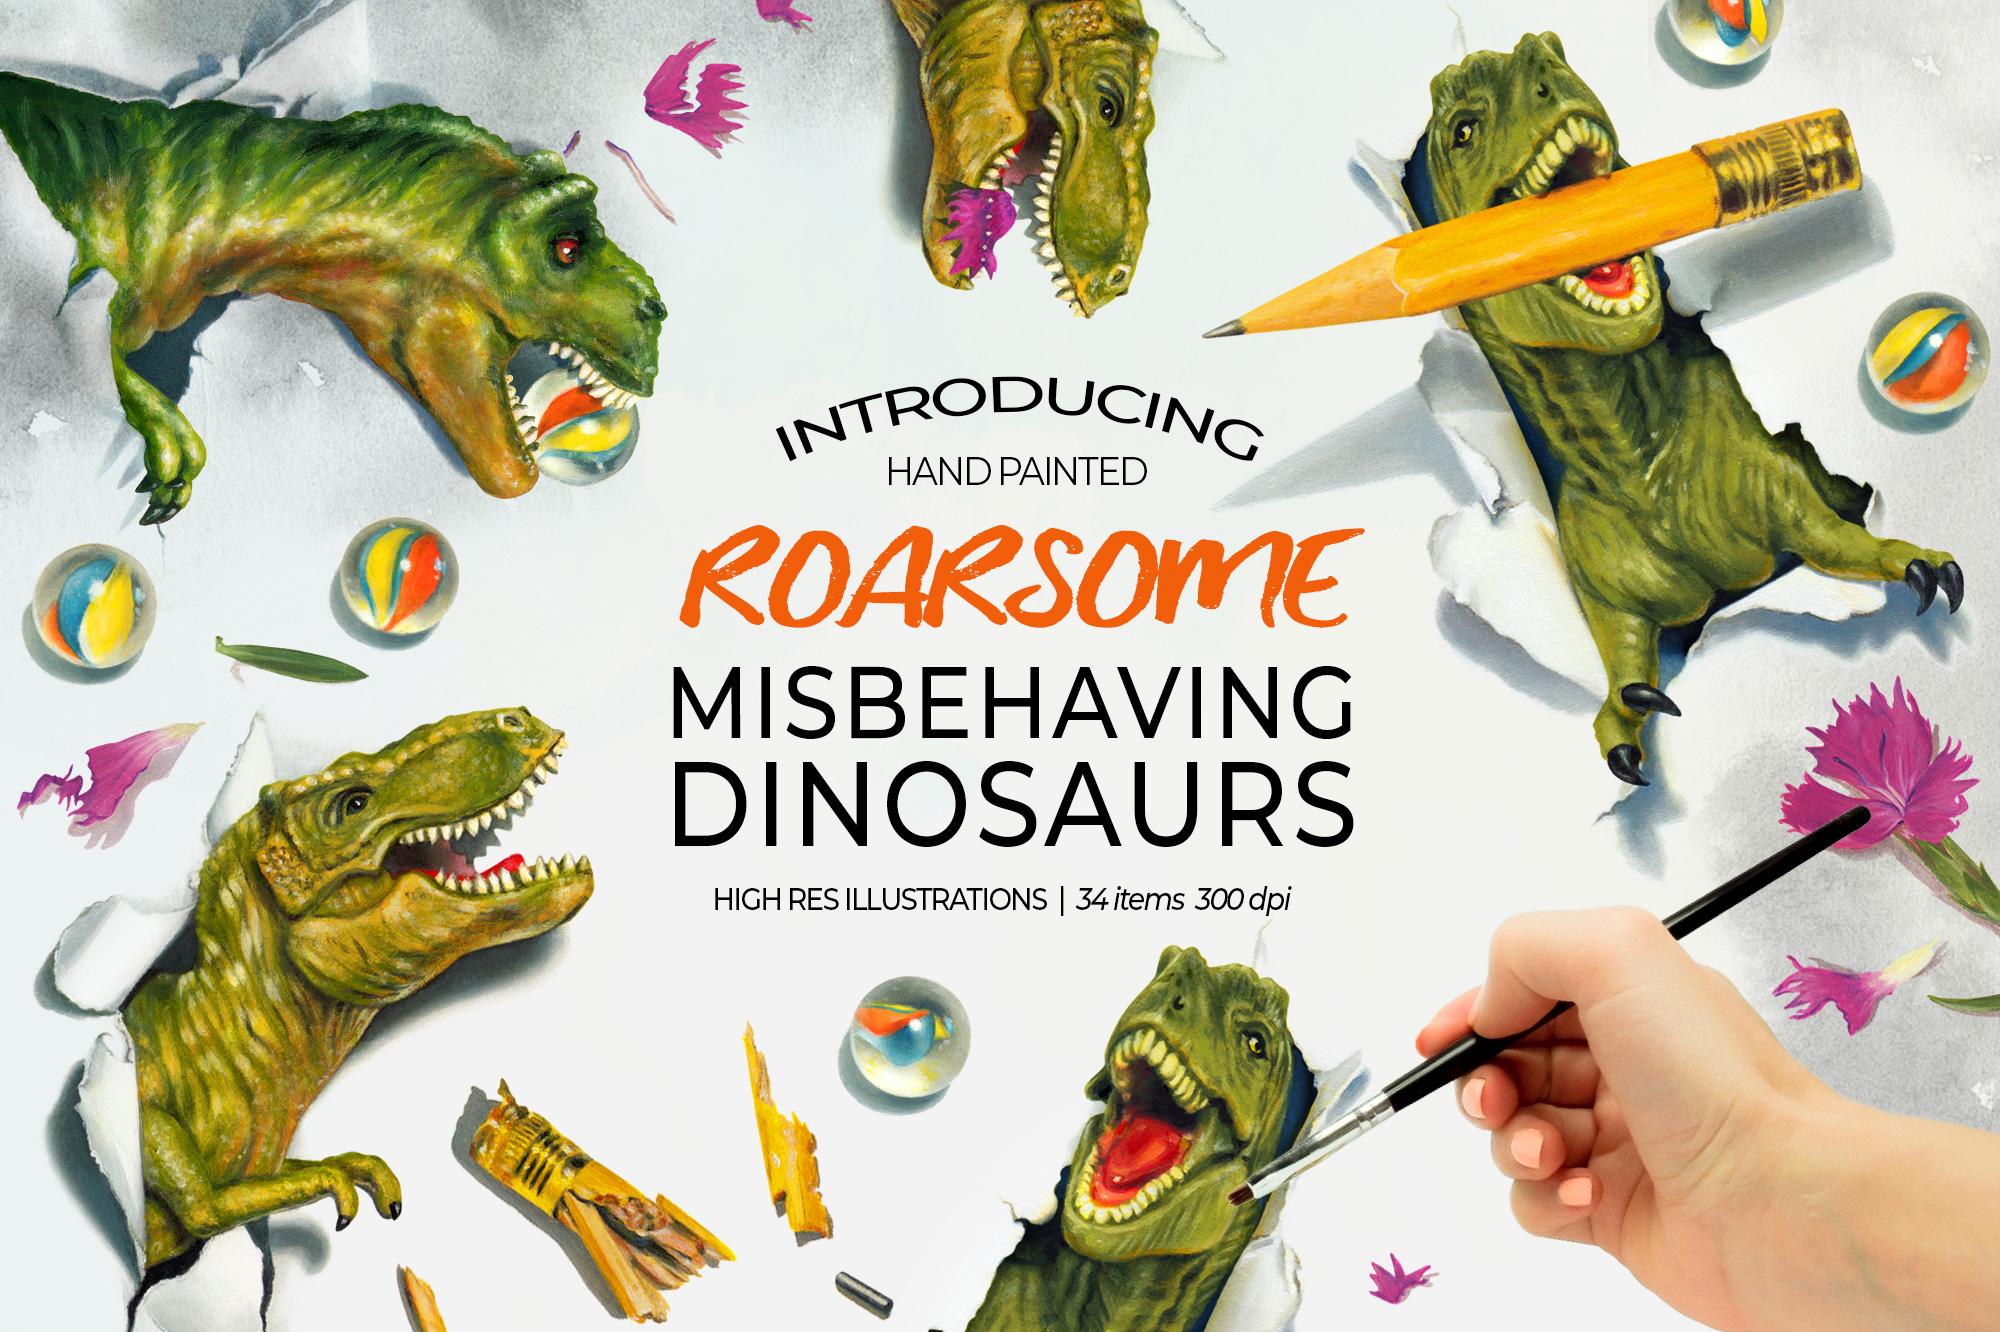 Dinosaurs Misbehaving- RoarsomeT-Rex example image 1